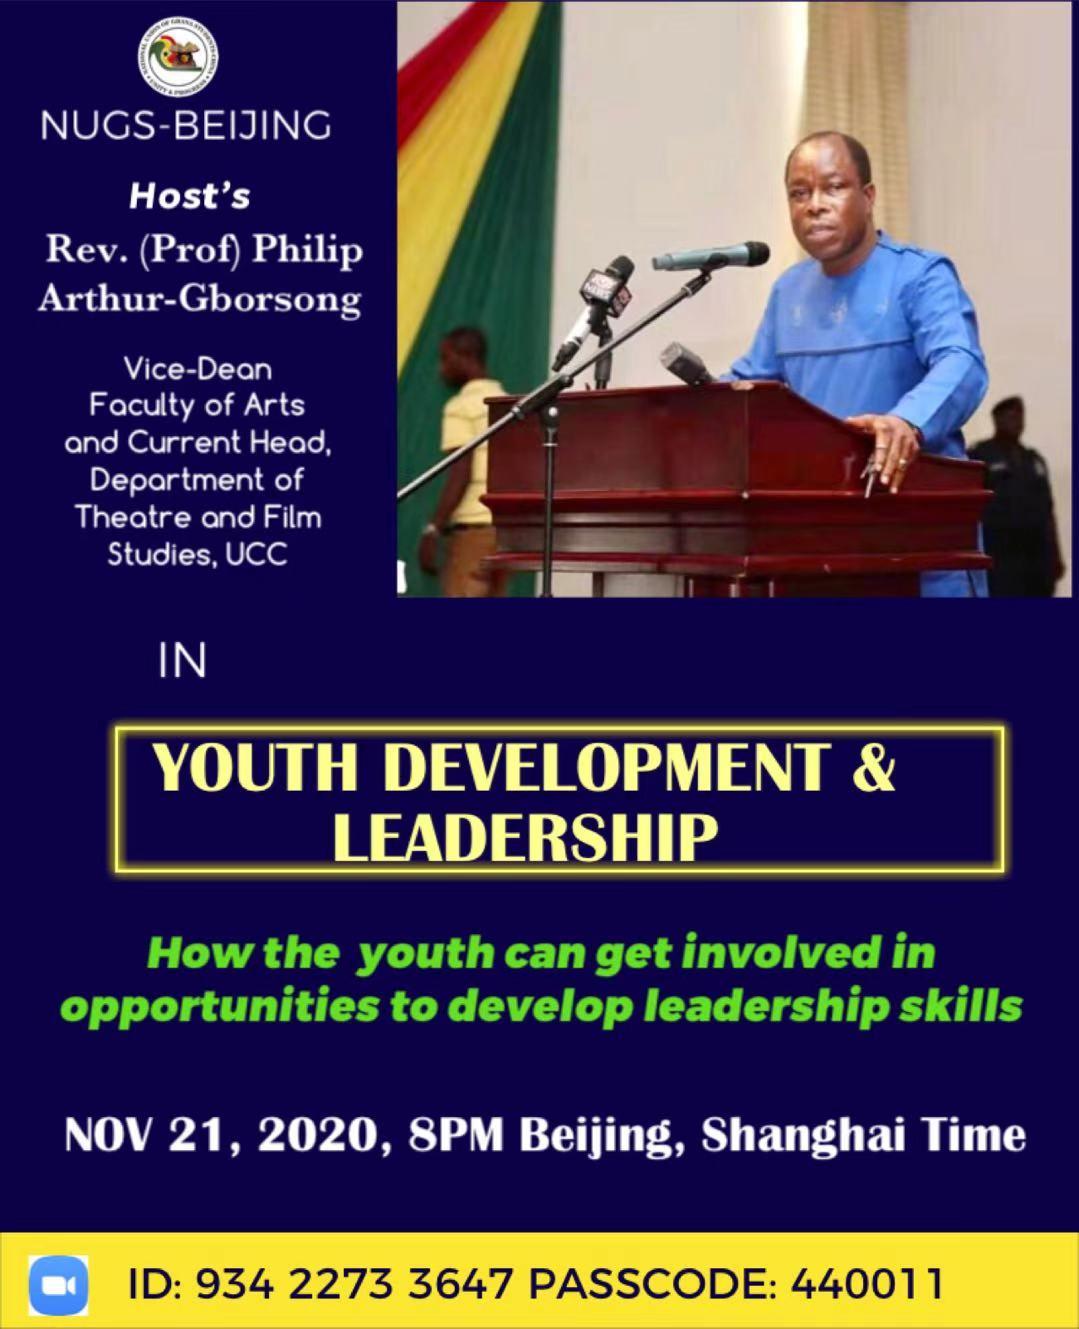 NUGS-Beijing: Youth Development & Leadership